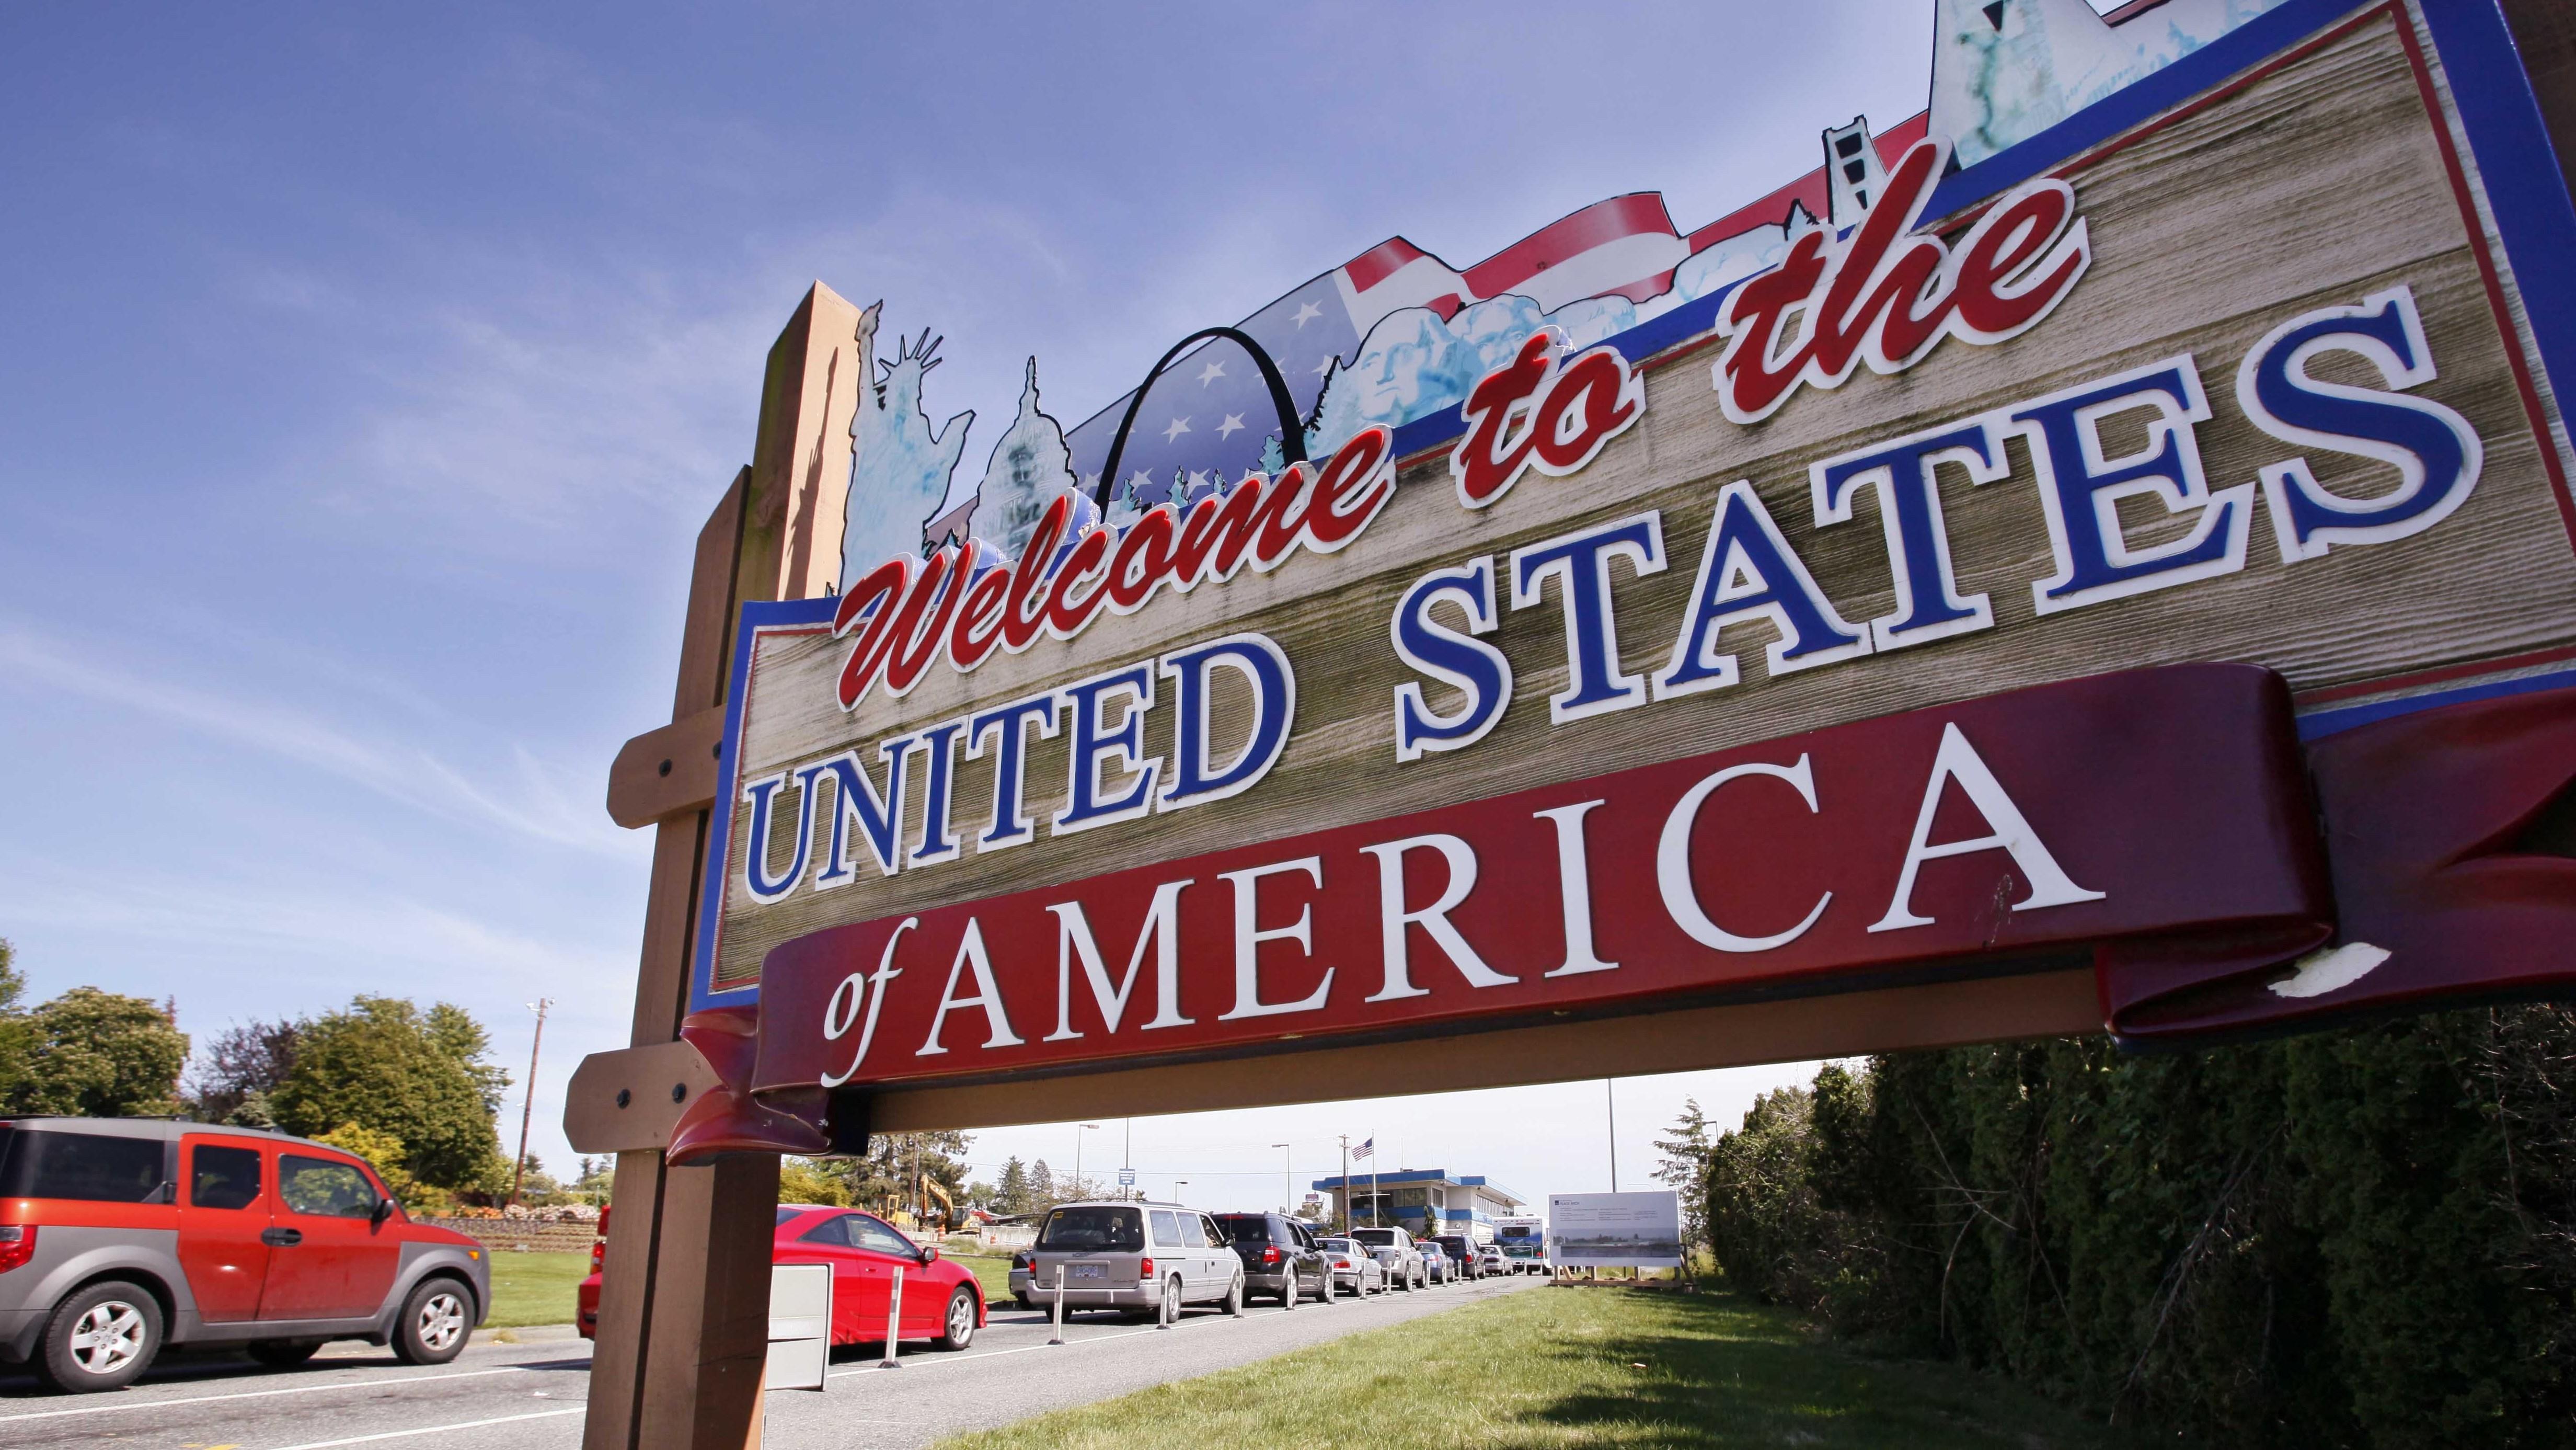 Tourists At The Border: Should Mental Illness Halt U.S. Entry?